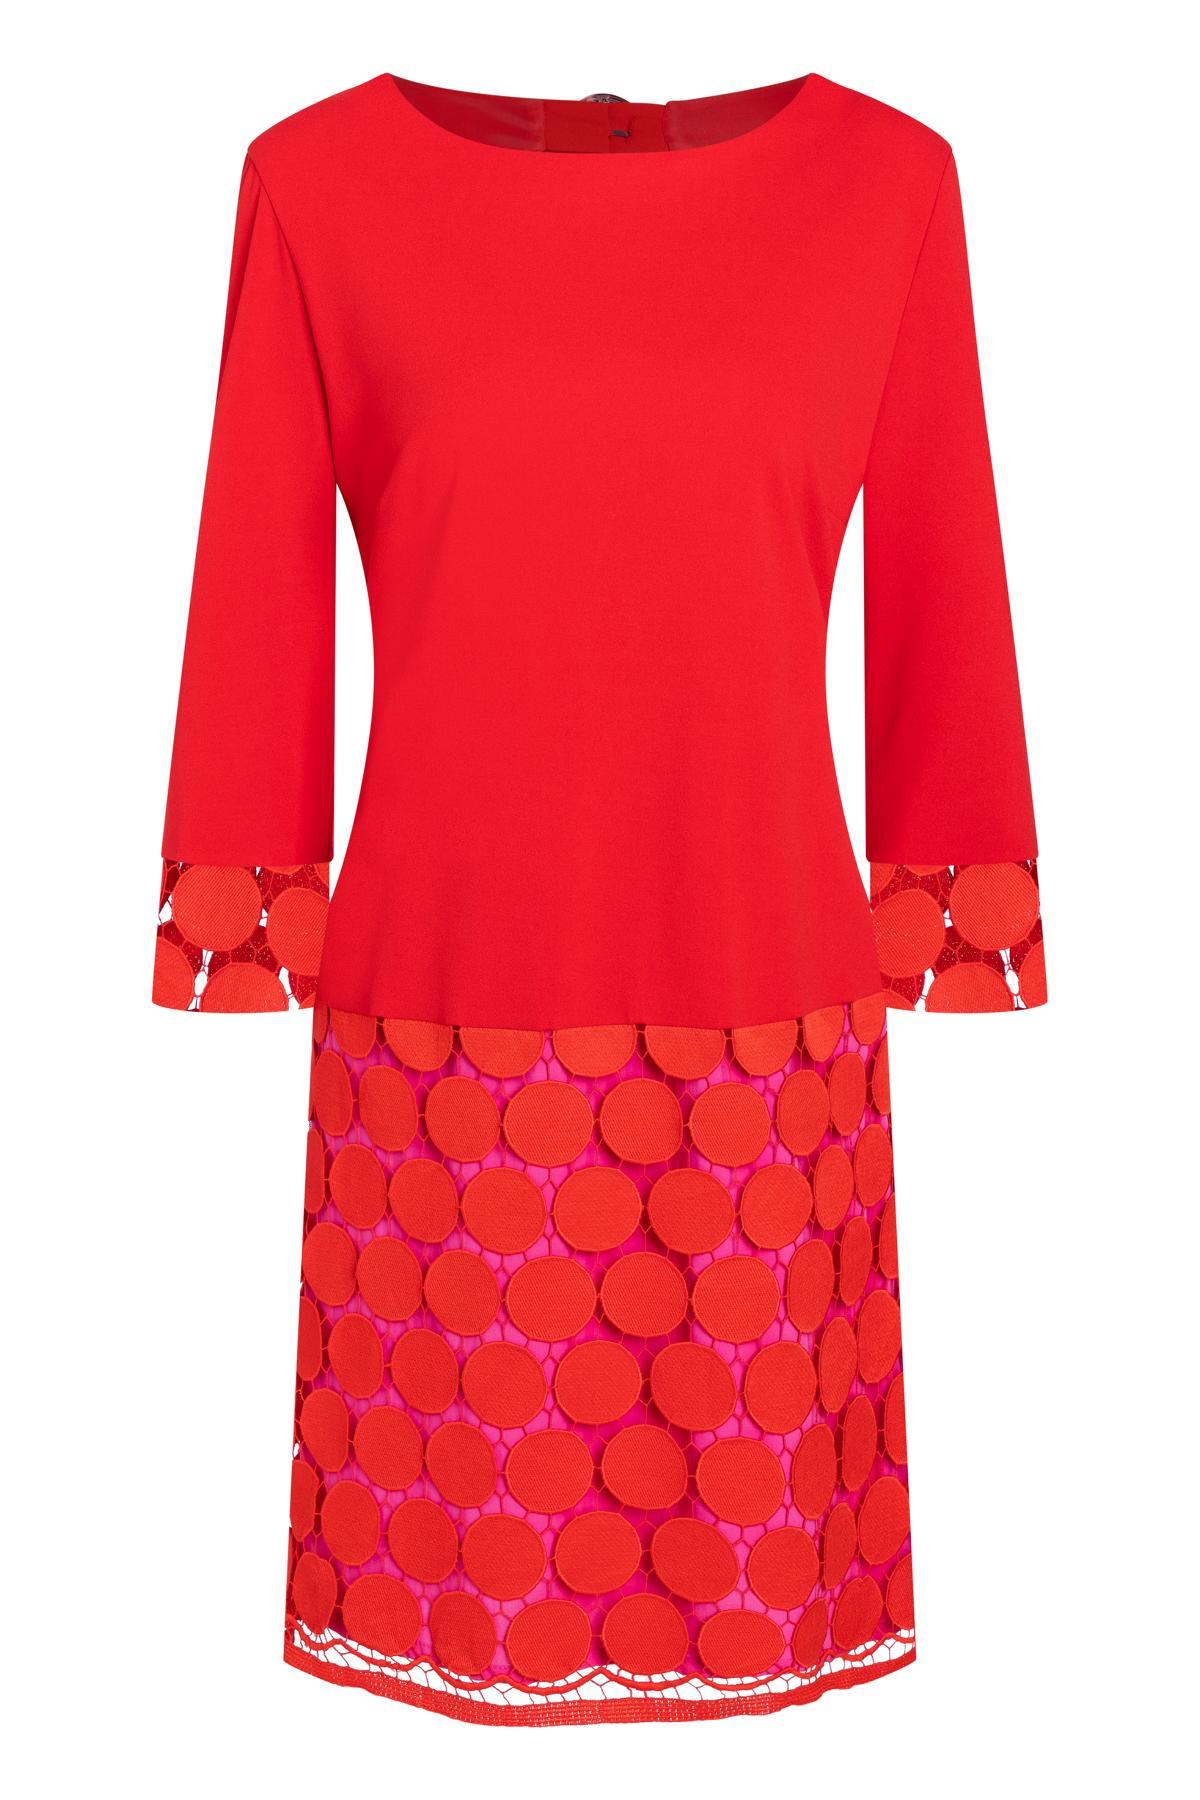 b450a9c3c4ef94 Rood sixties jurk Sakani van stippen-kant